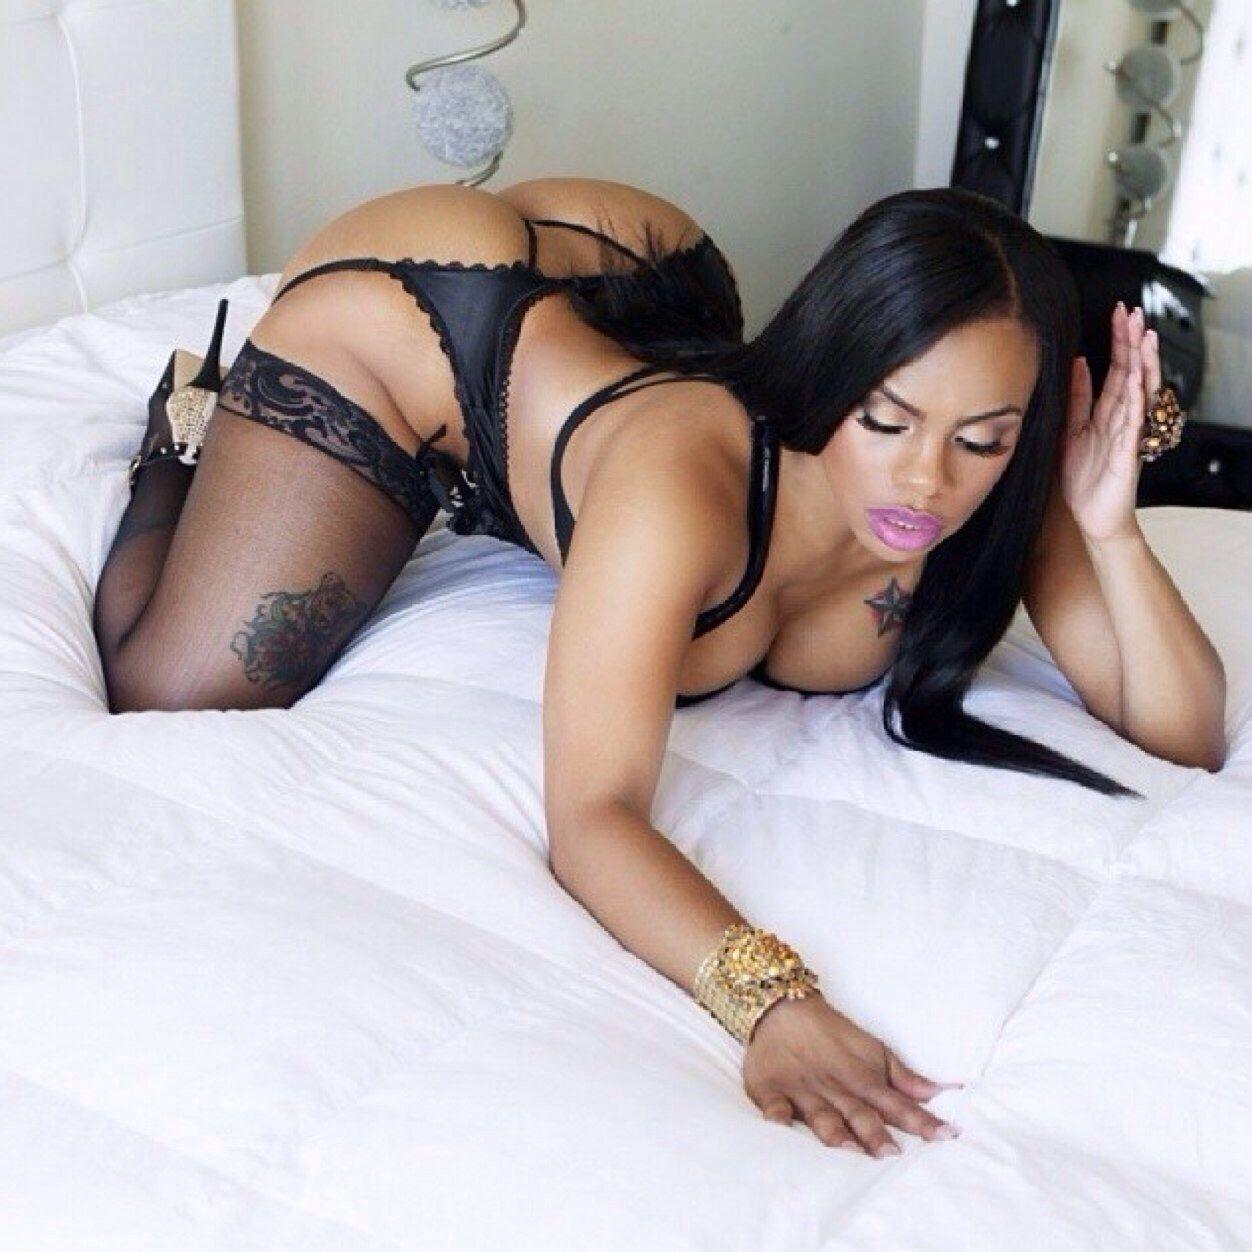 Amazin Amie Porn Delightful dominique chinn | dominique chinn | pinterest | beautiful ladies